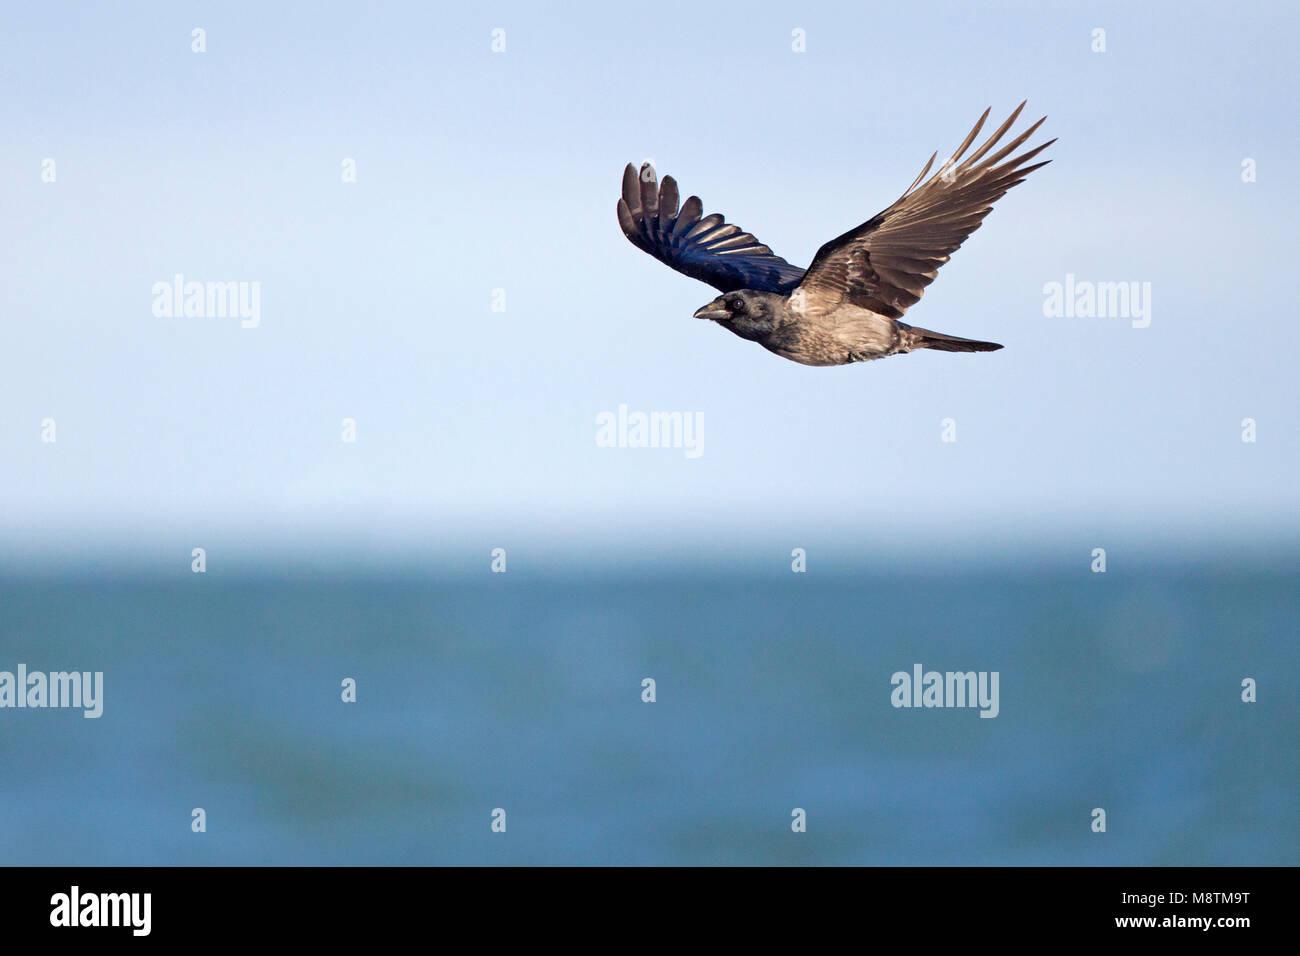 Hybride Bonte Kraai x Zwarte Kraai vliegend; Hybrid Hooded Crow x Carrion Crow flying Stock Photo